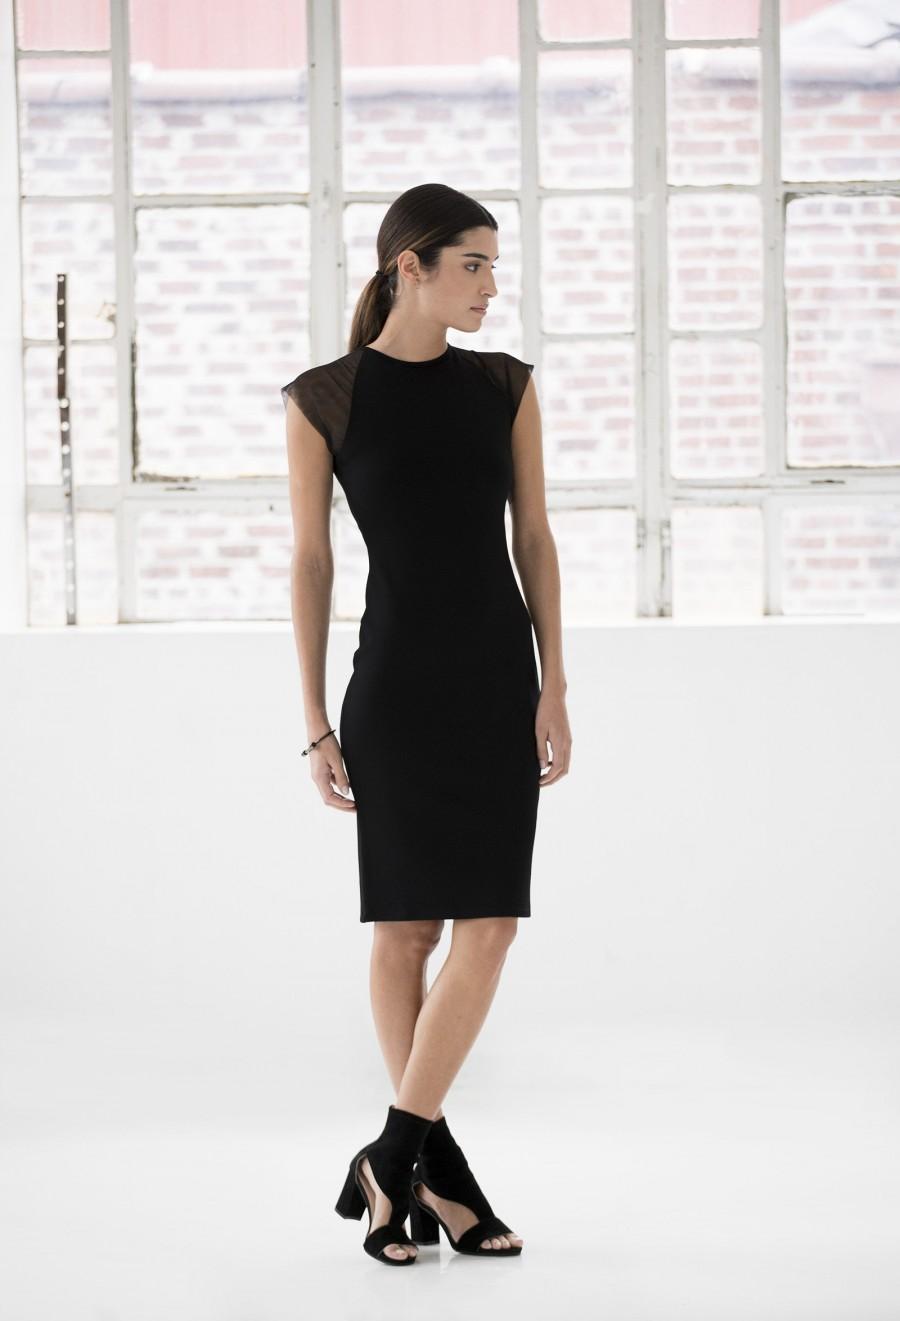 Свадьба - Stylish Dress / Pencil Dress / Fitted Dress / Extravagant Dress / Mesh Dress / Cocktail Dress  / Marcellamoda - MD1012